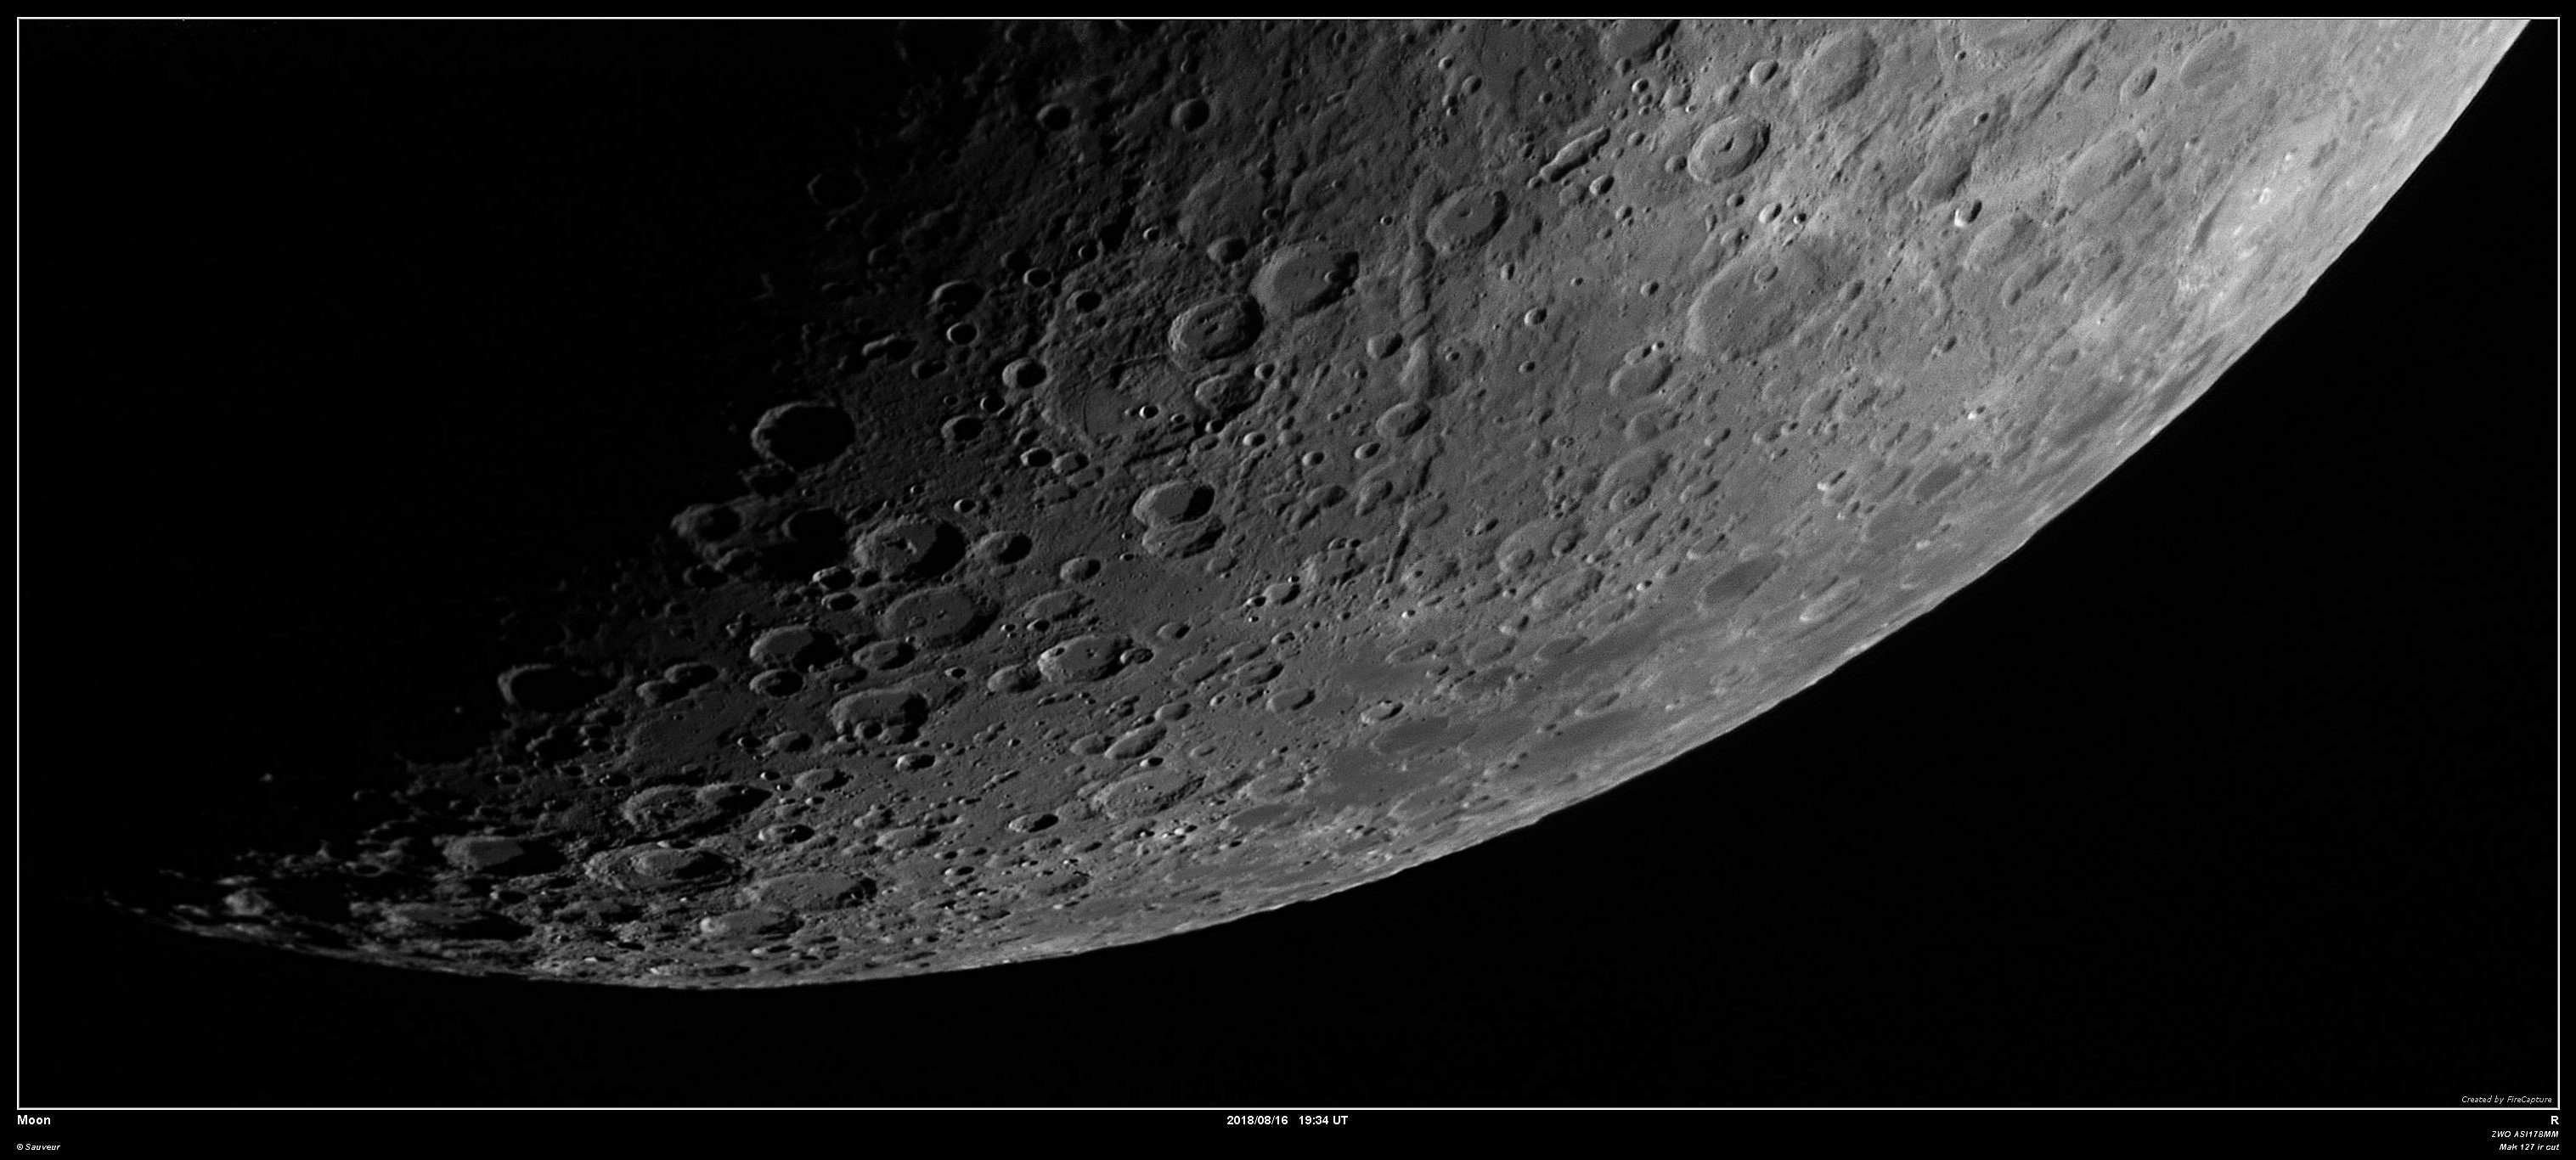 Moon_213455_lapl4_ap85_stitch_web.jpg